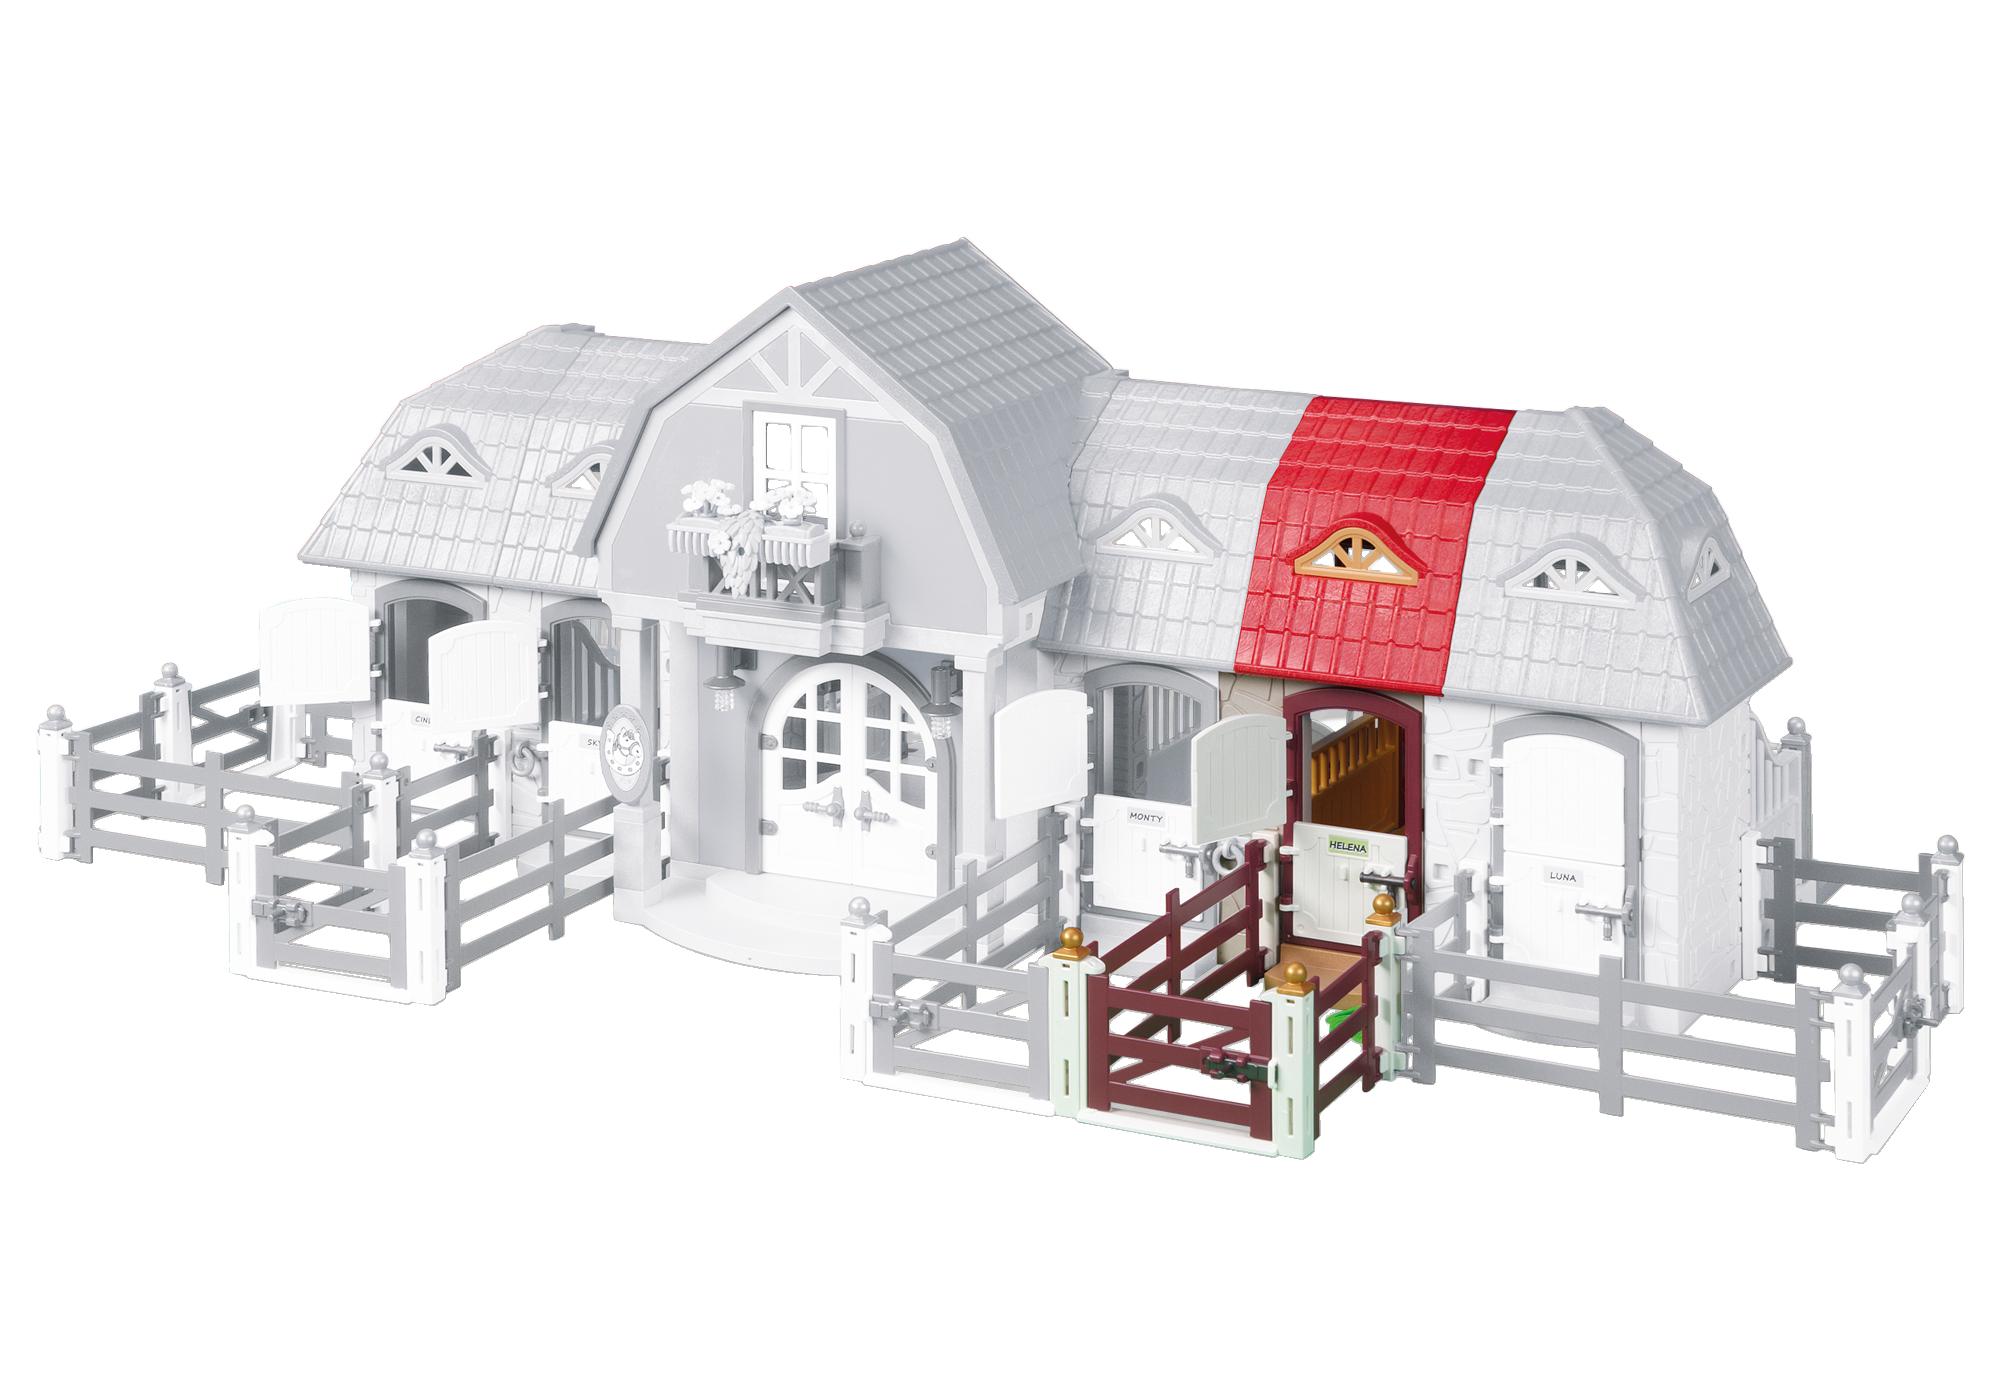 http://media.playmobil.com/i/playmobil/6254_product_detail/Boxe supplémentaire pour haras